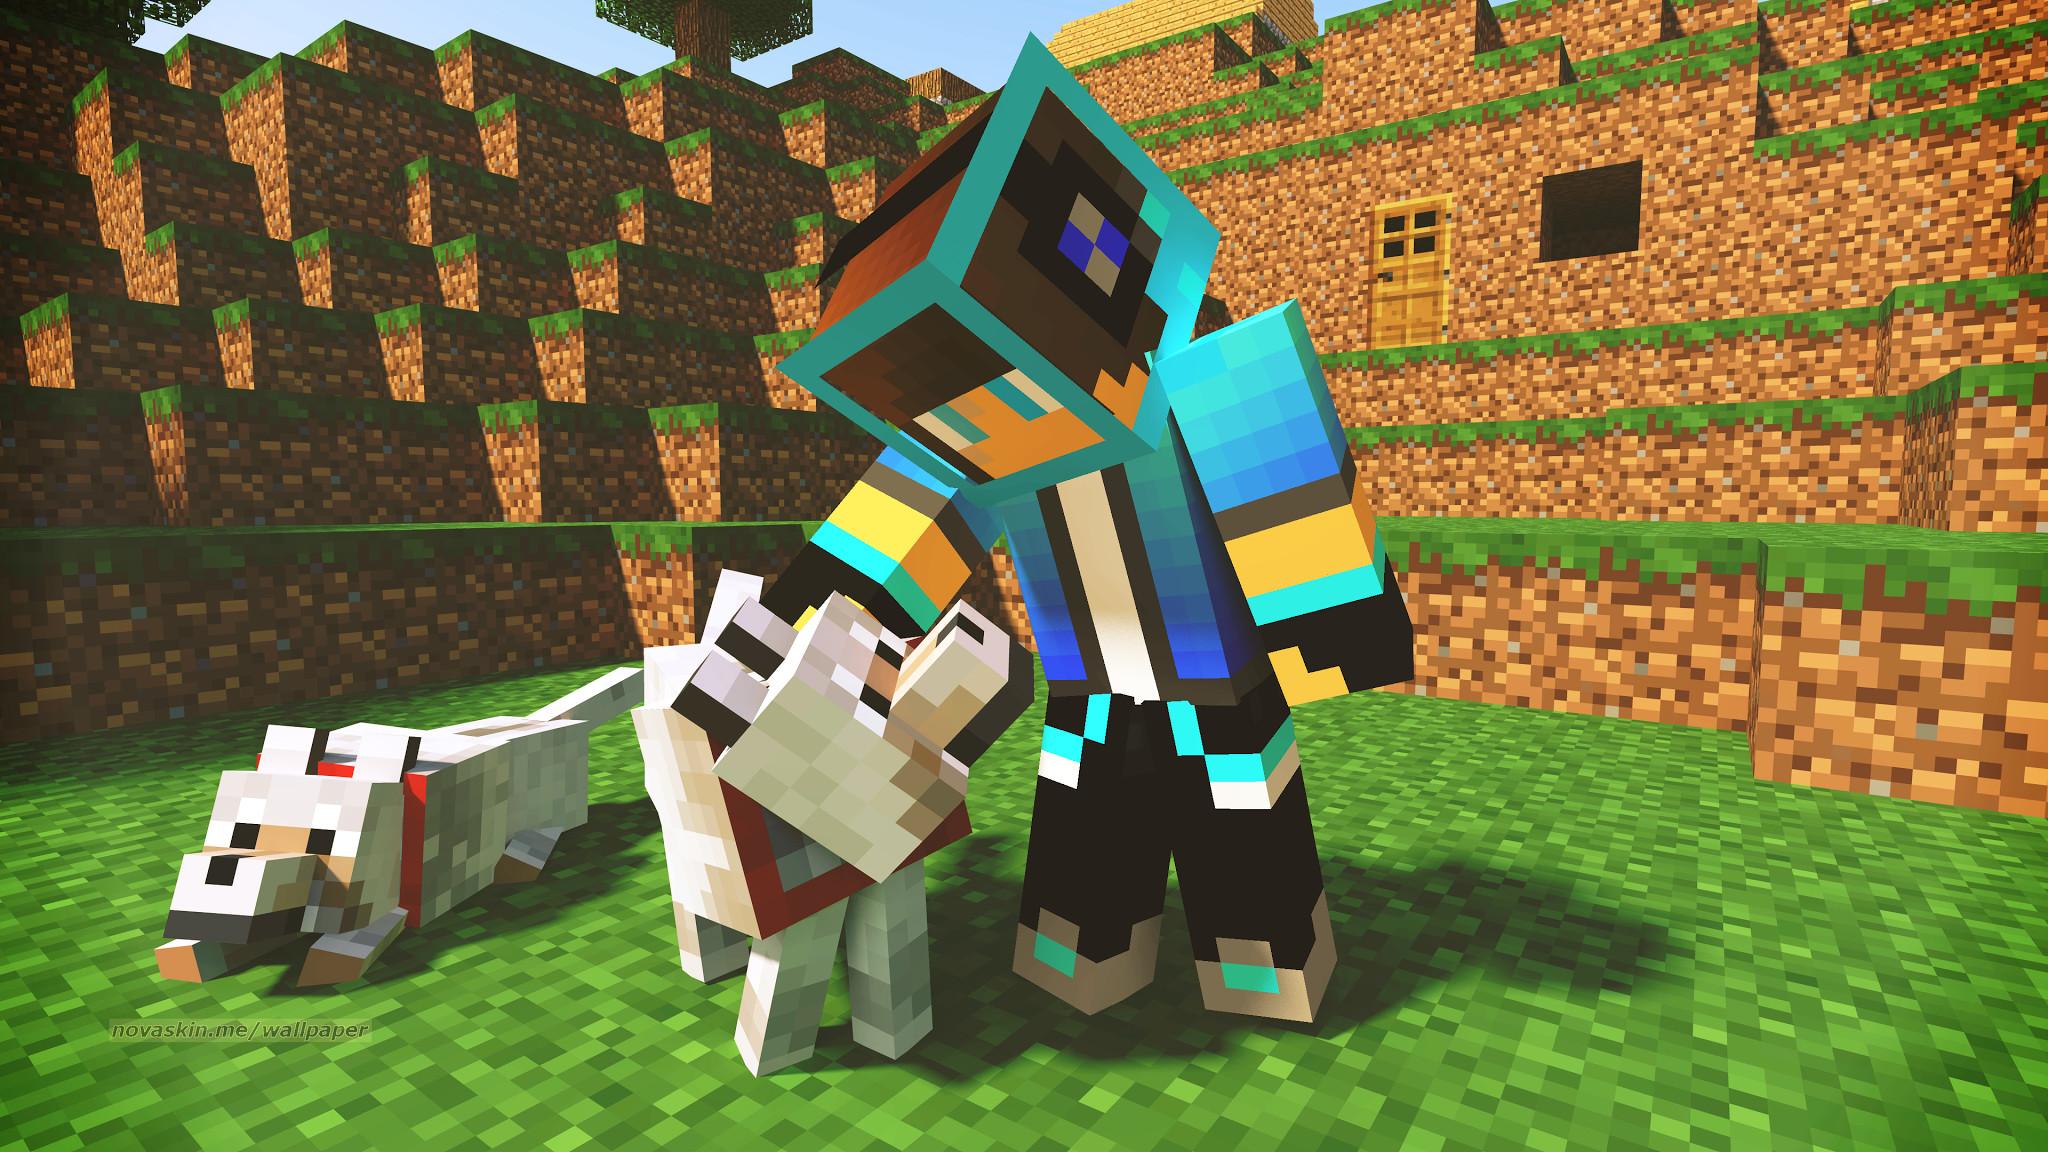 <b>Minecraft</b> mob talker online hot high quality 434193,